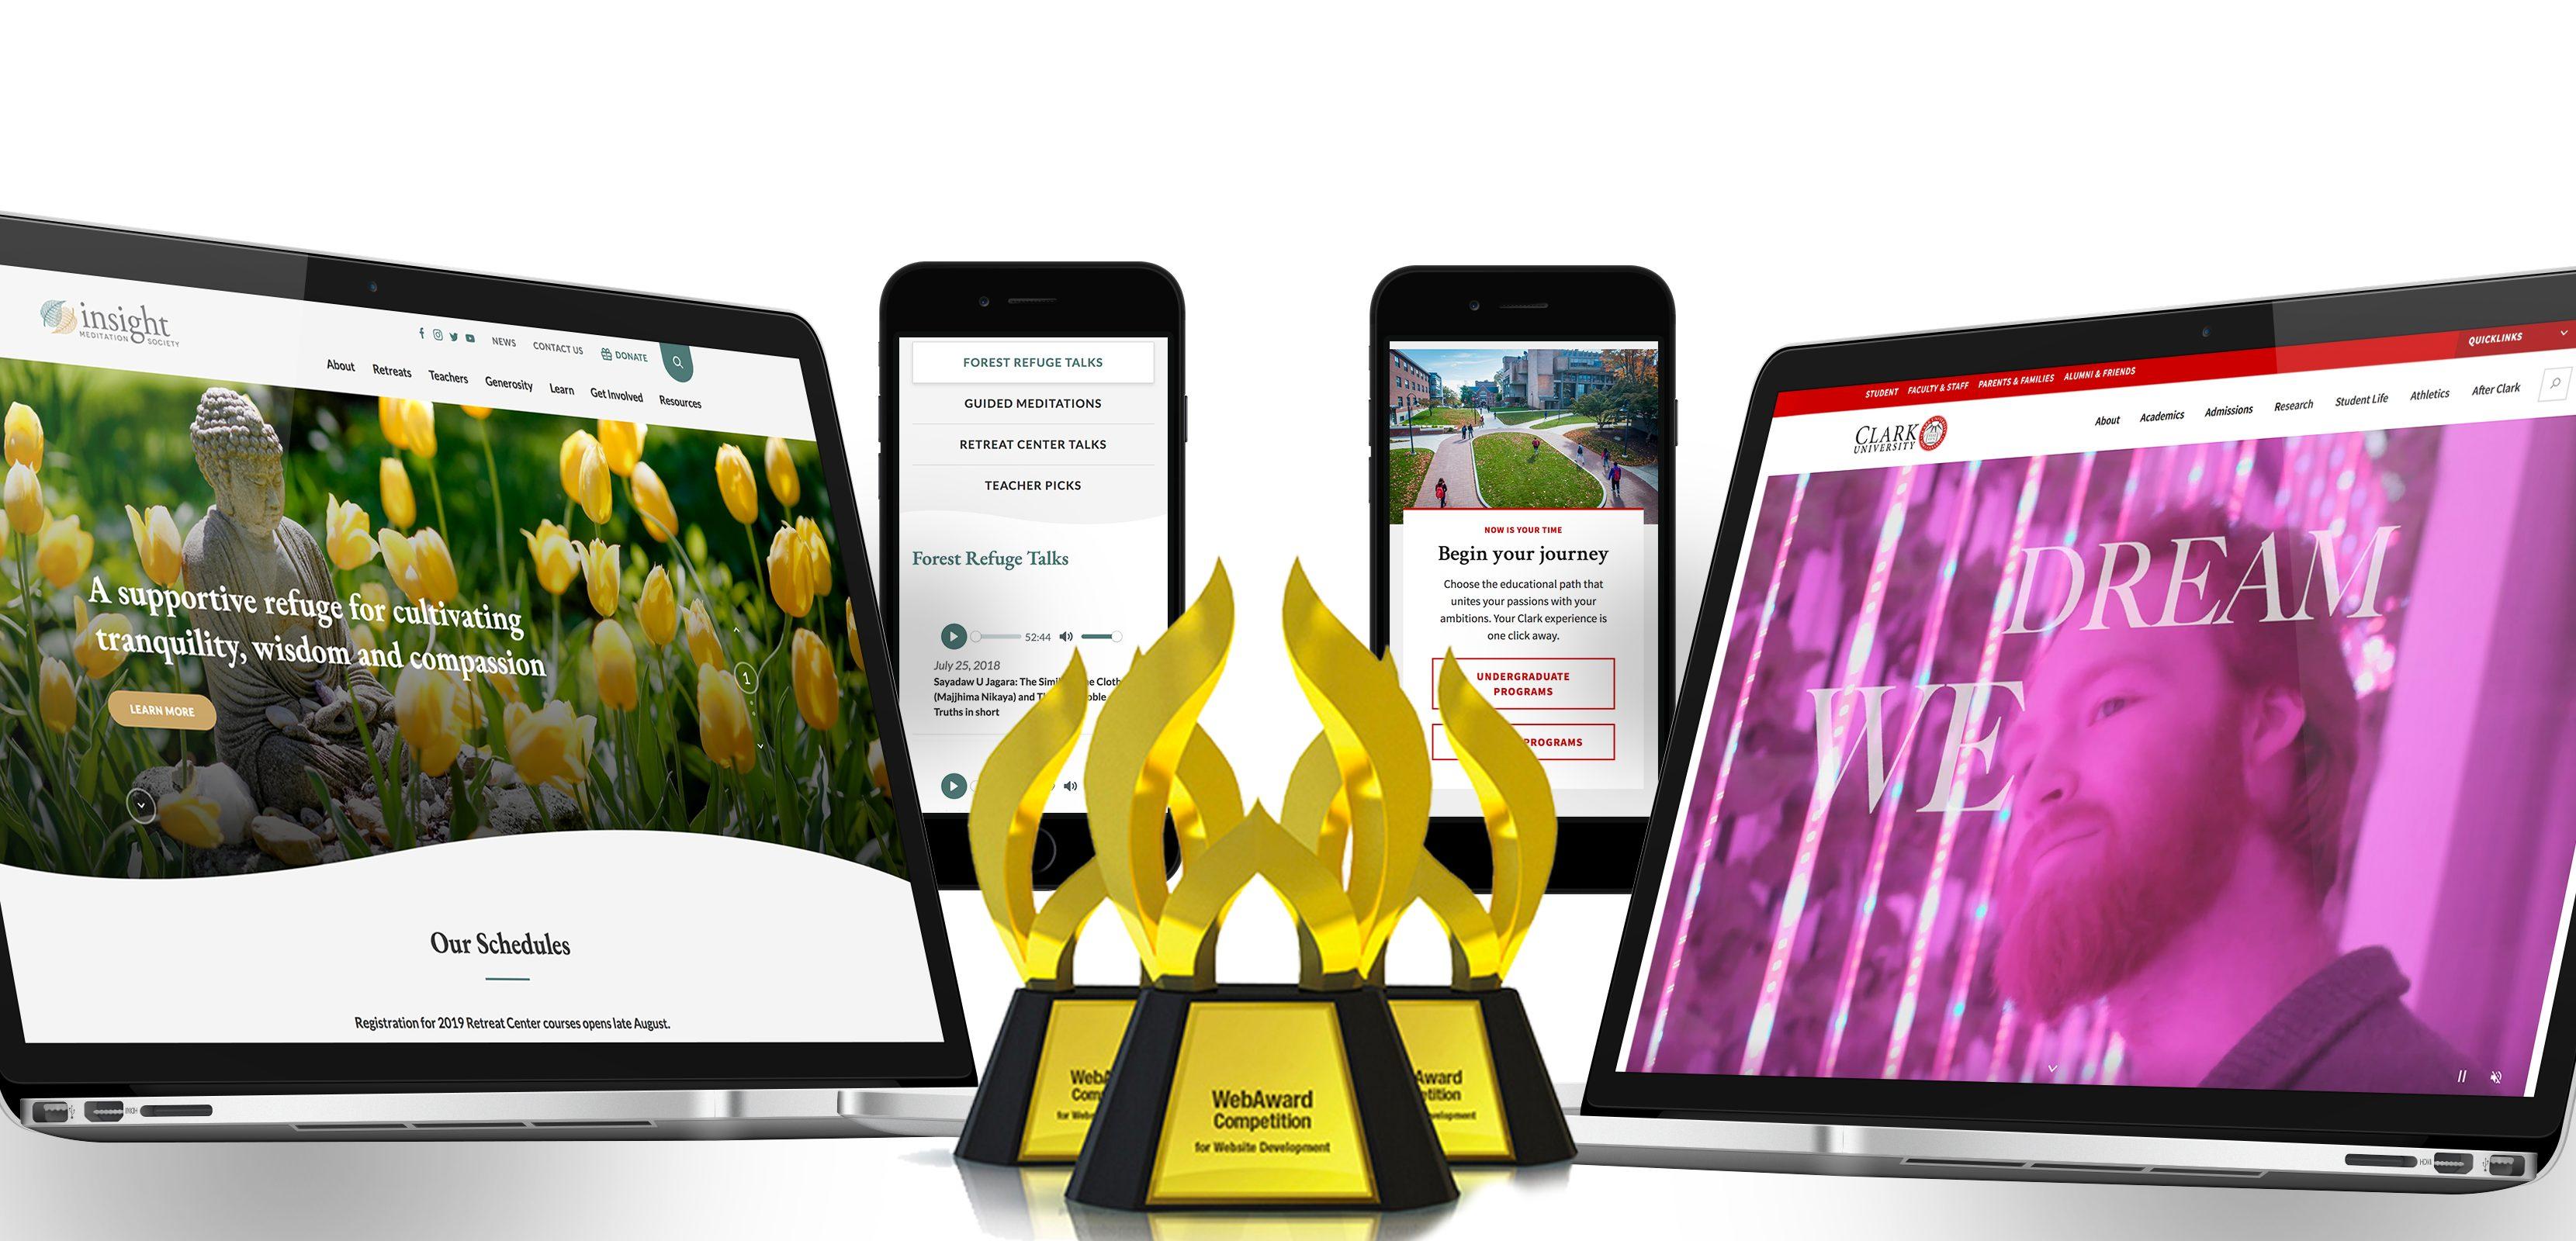 WebAward trophy for Insight Meditation Society and Clark University website designs